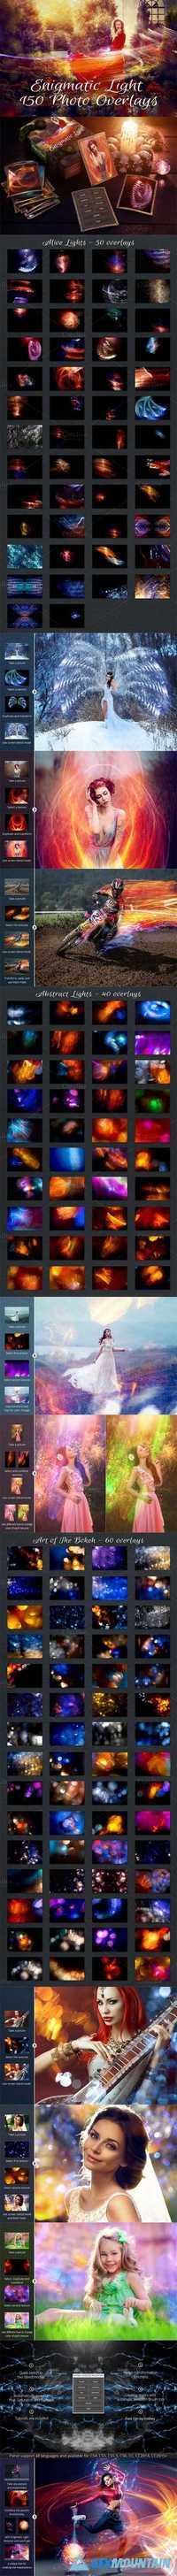 Enigmatic Light - 150 Photo Оverlays 677625